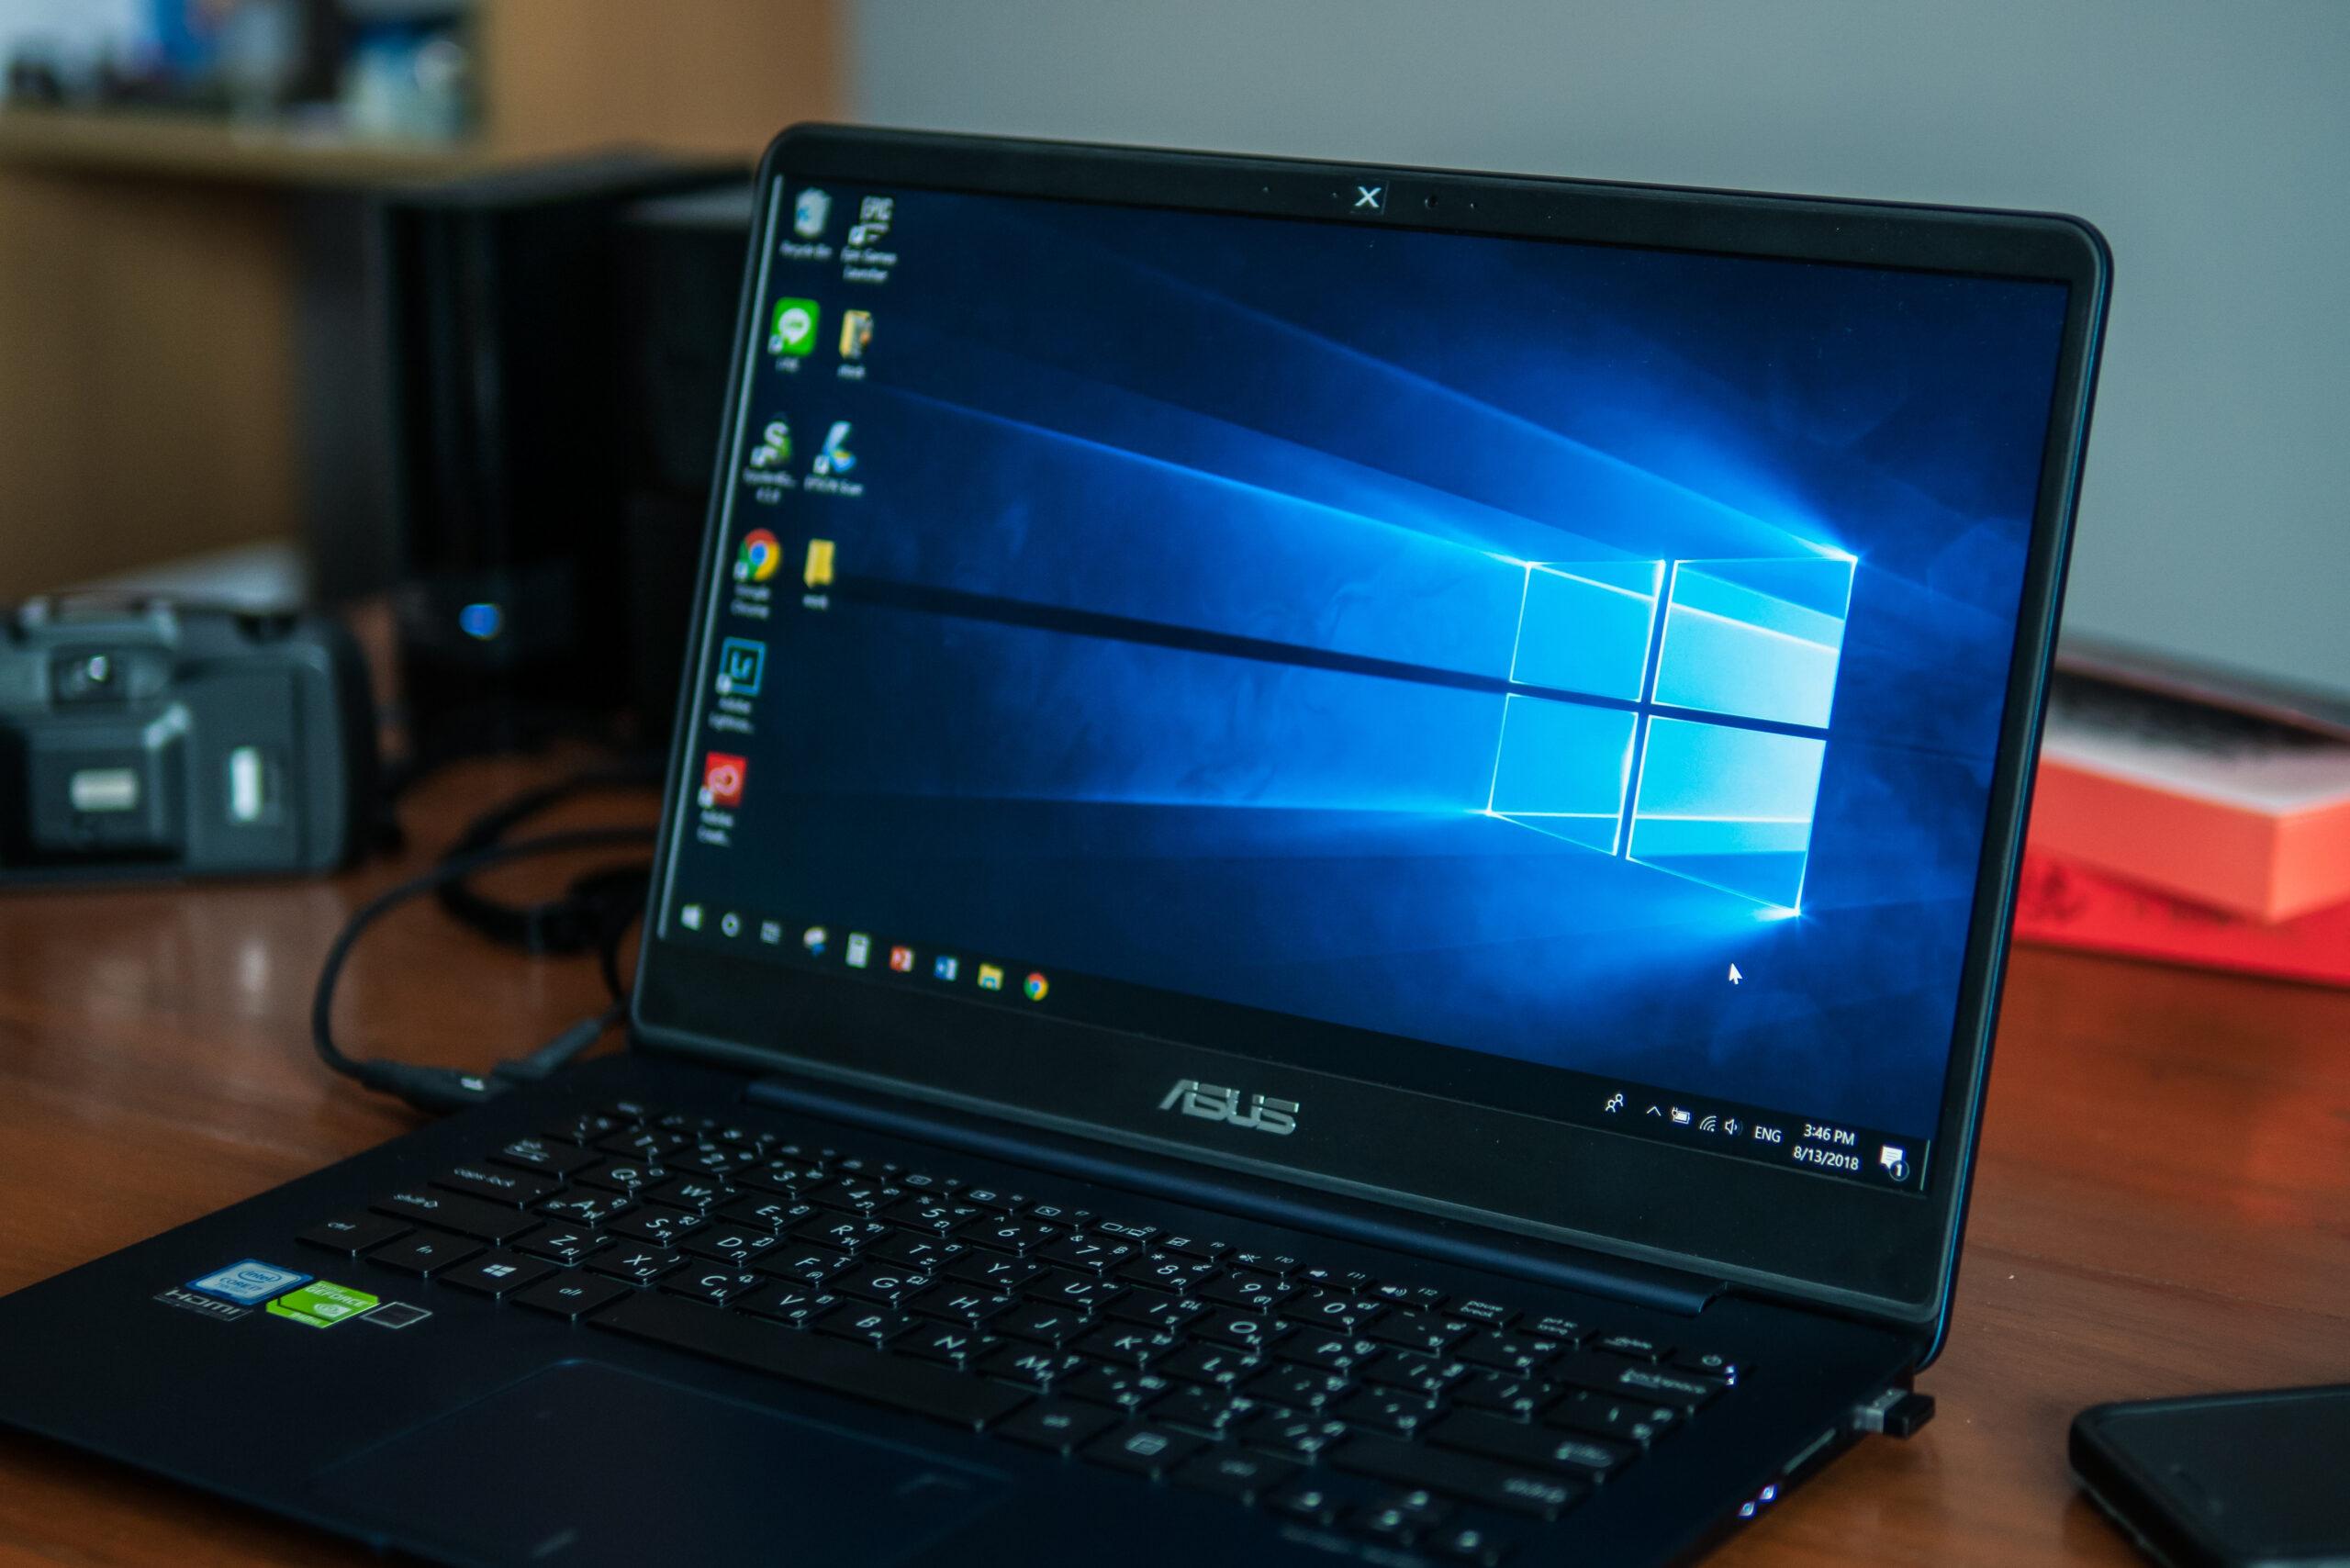 【Windows10】ディスククリーンアップの方法